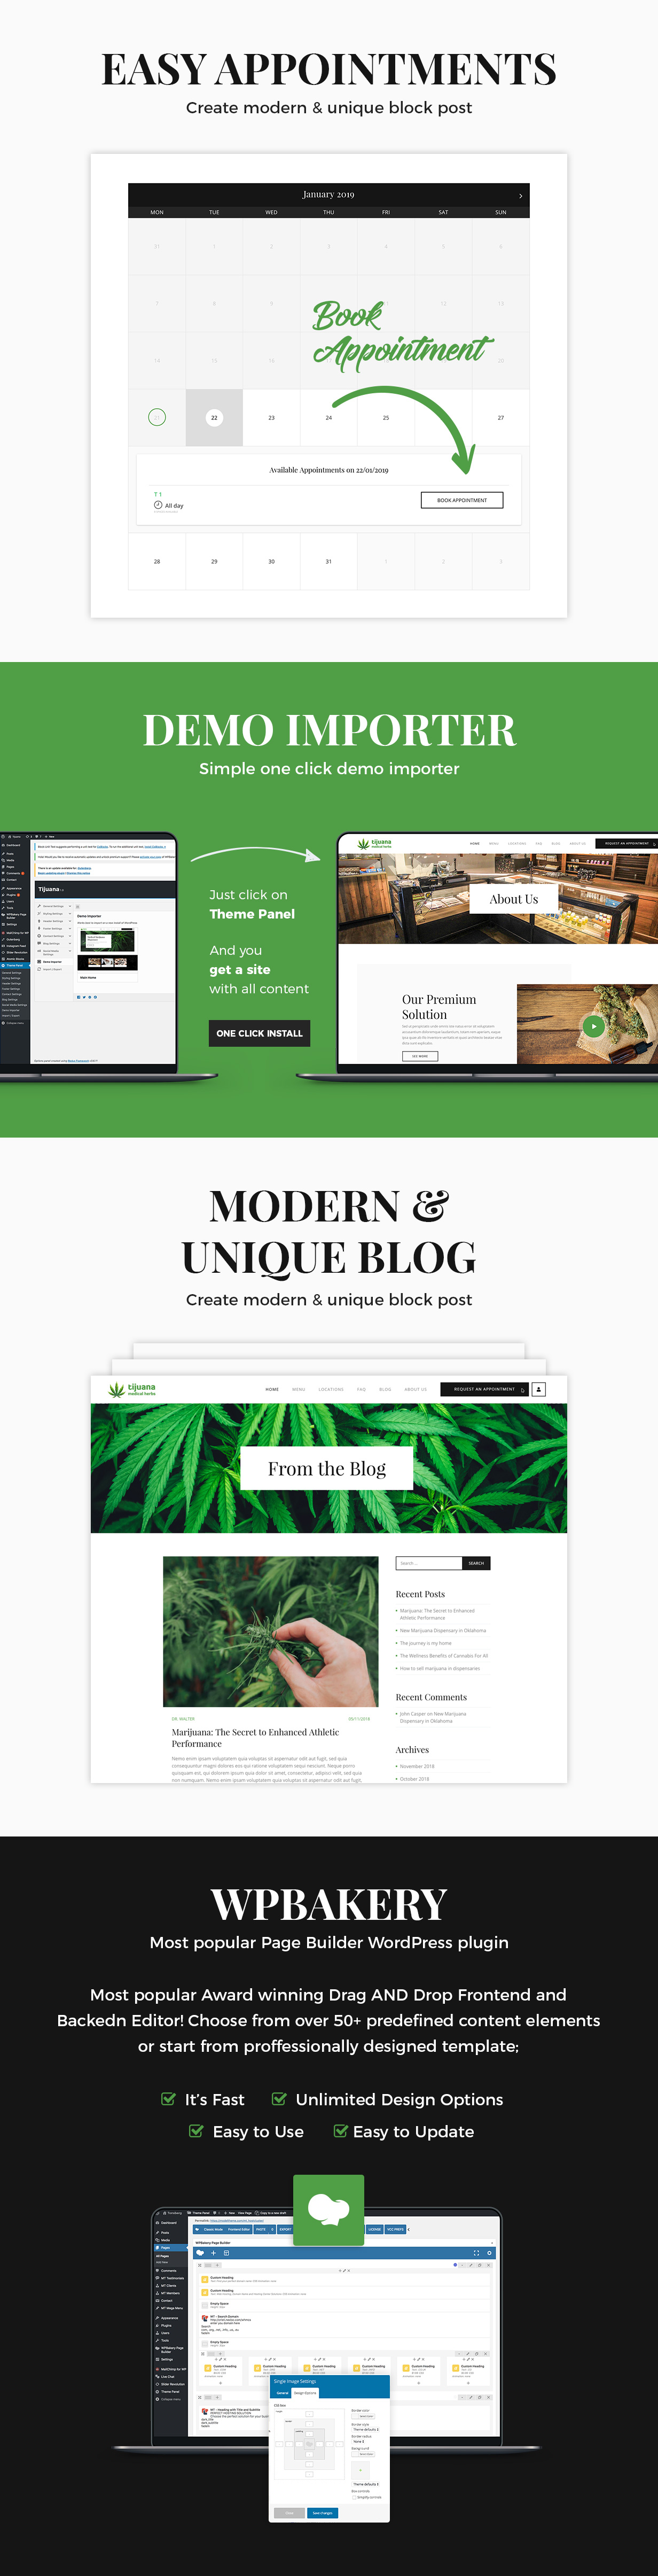 Tijuana - Marijuana Dispensary & Medical WordPress Theme - 5